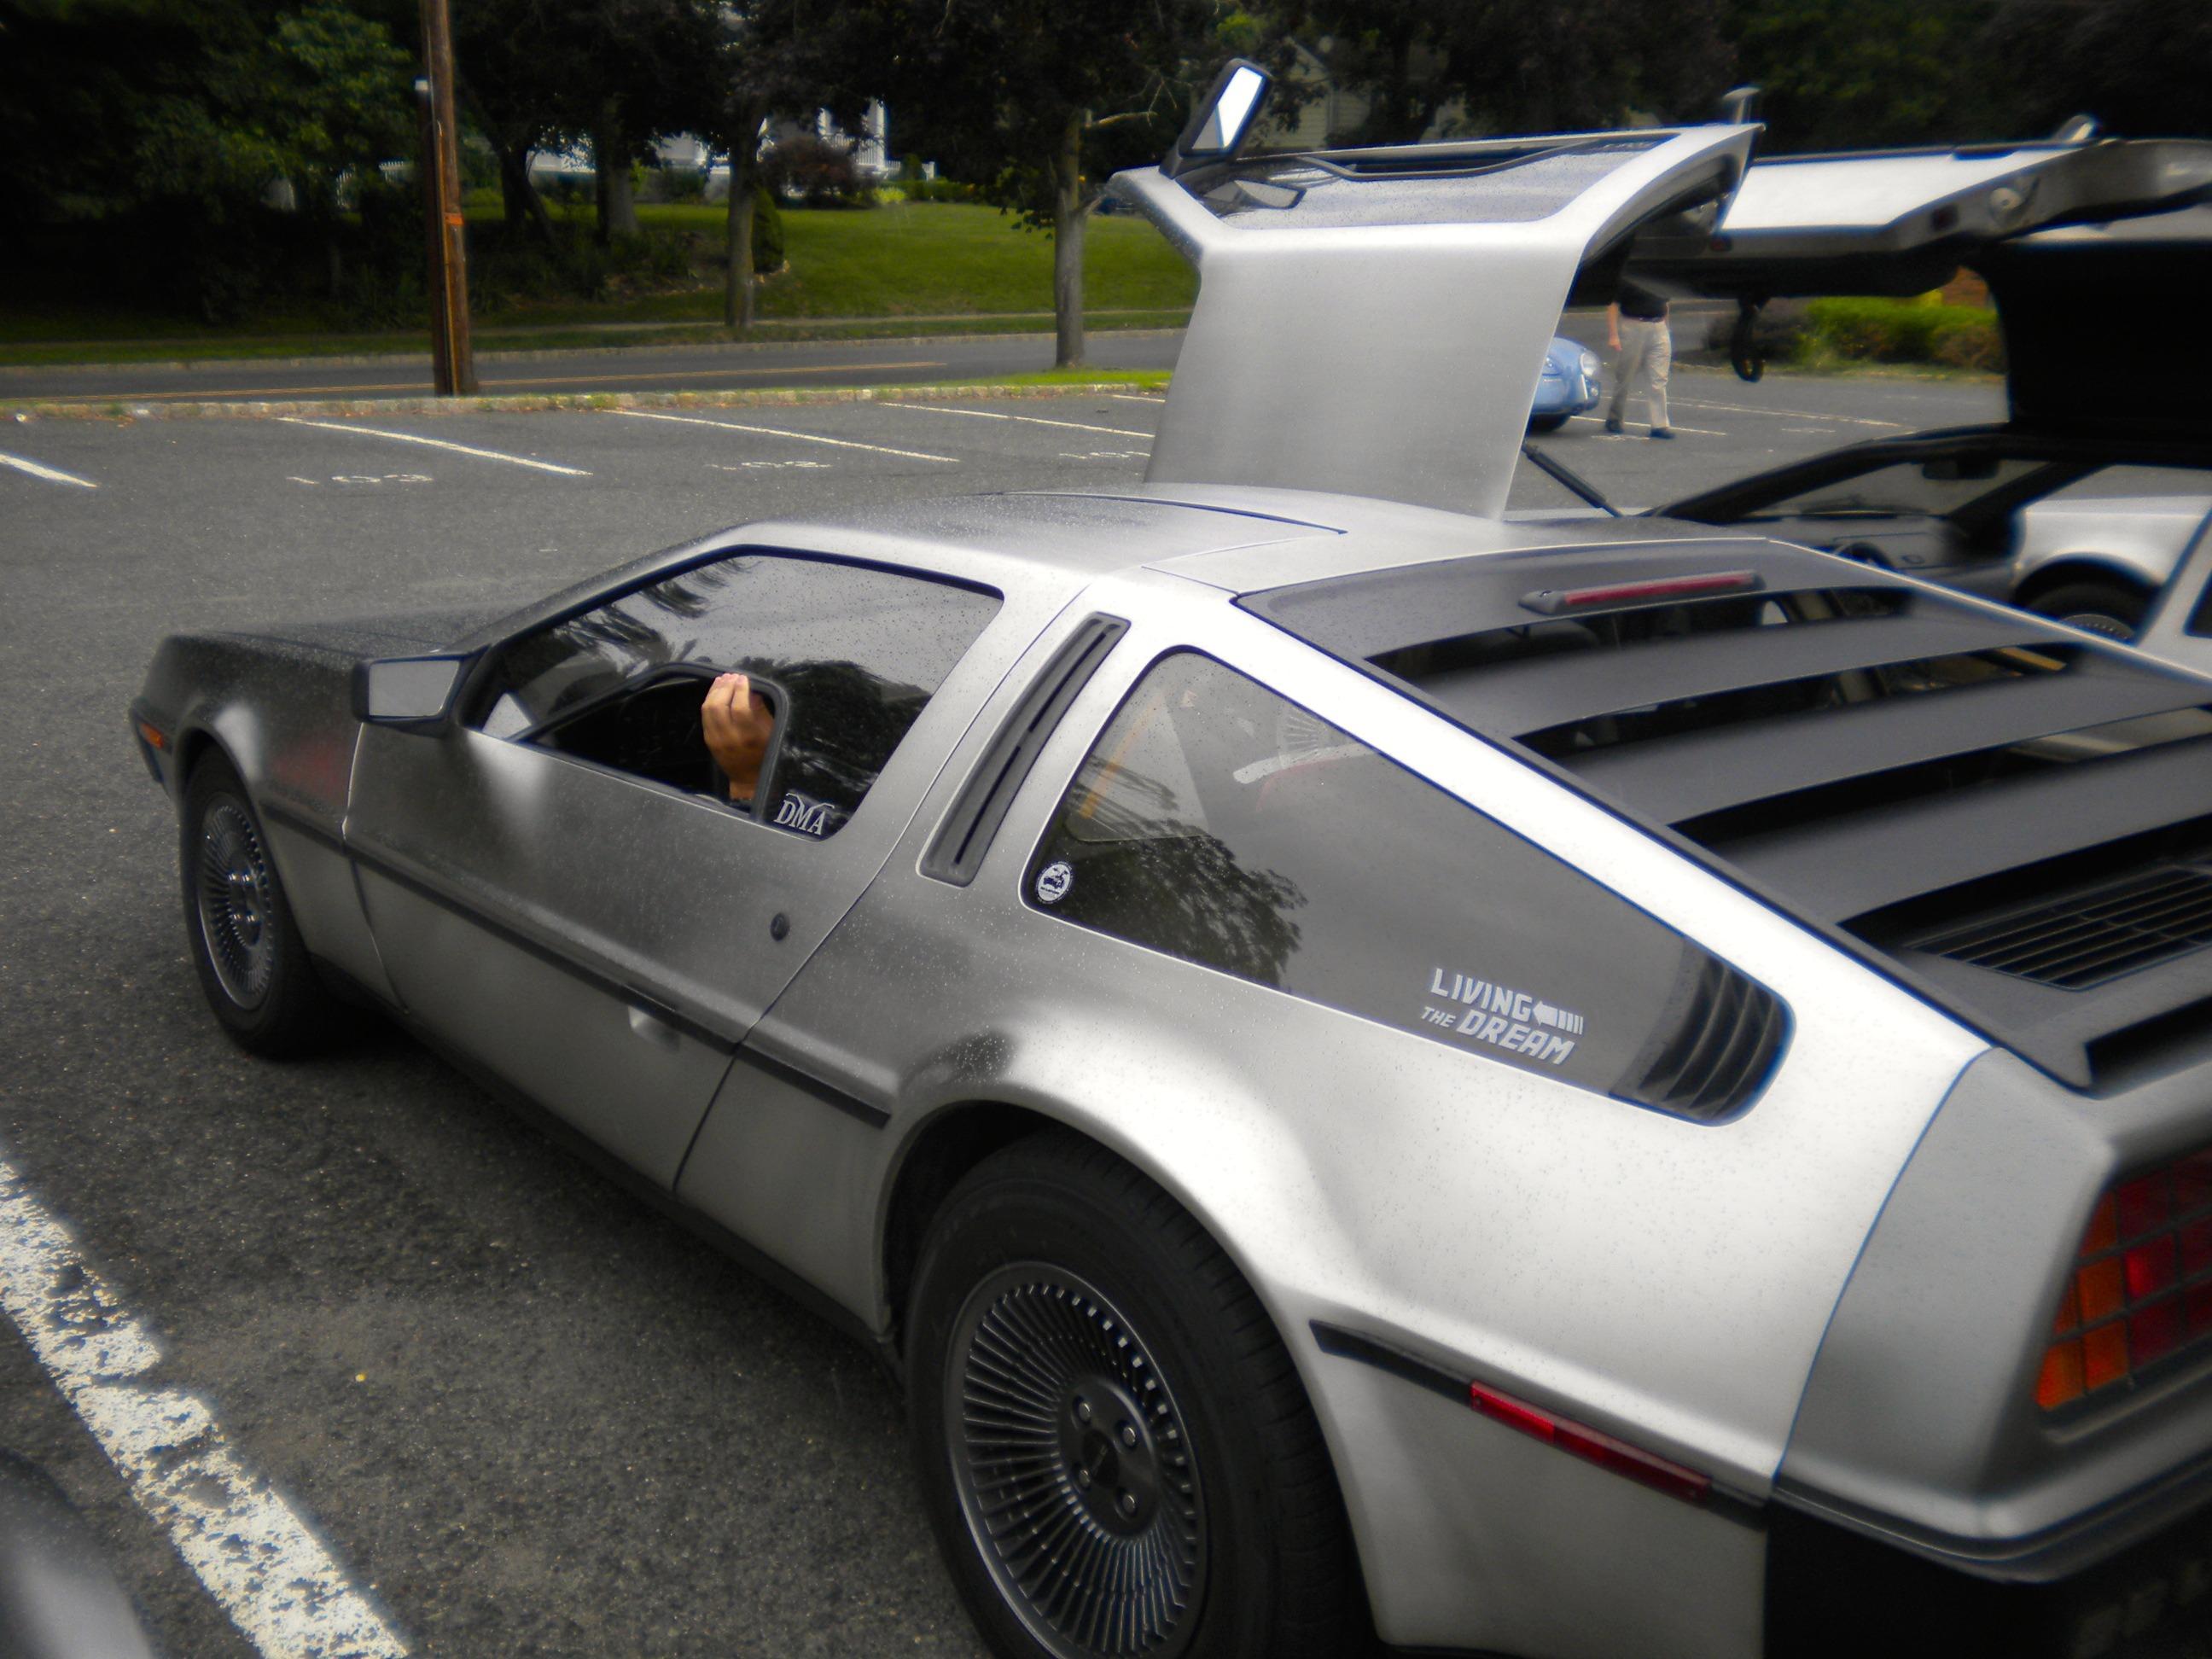 Mid-Atlantic DeLorean Collectors Gather in Chatham